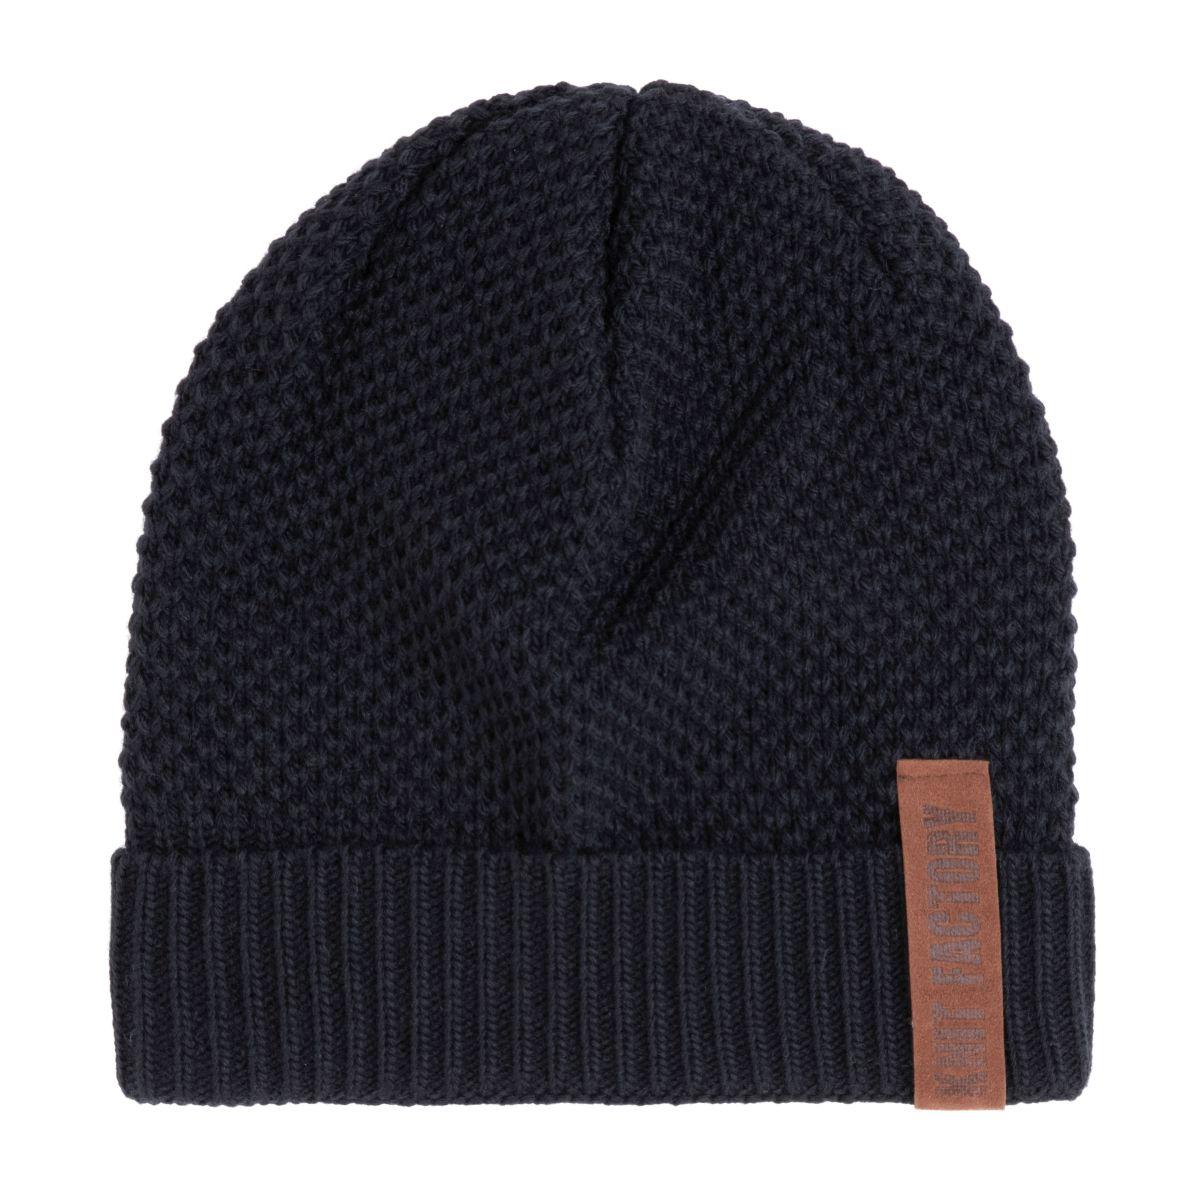 knit factory 1237026 jazz beanie navy 1